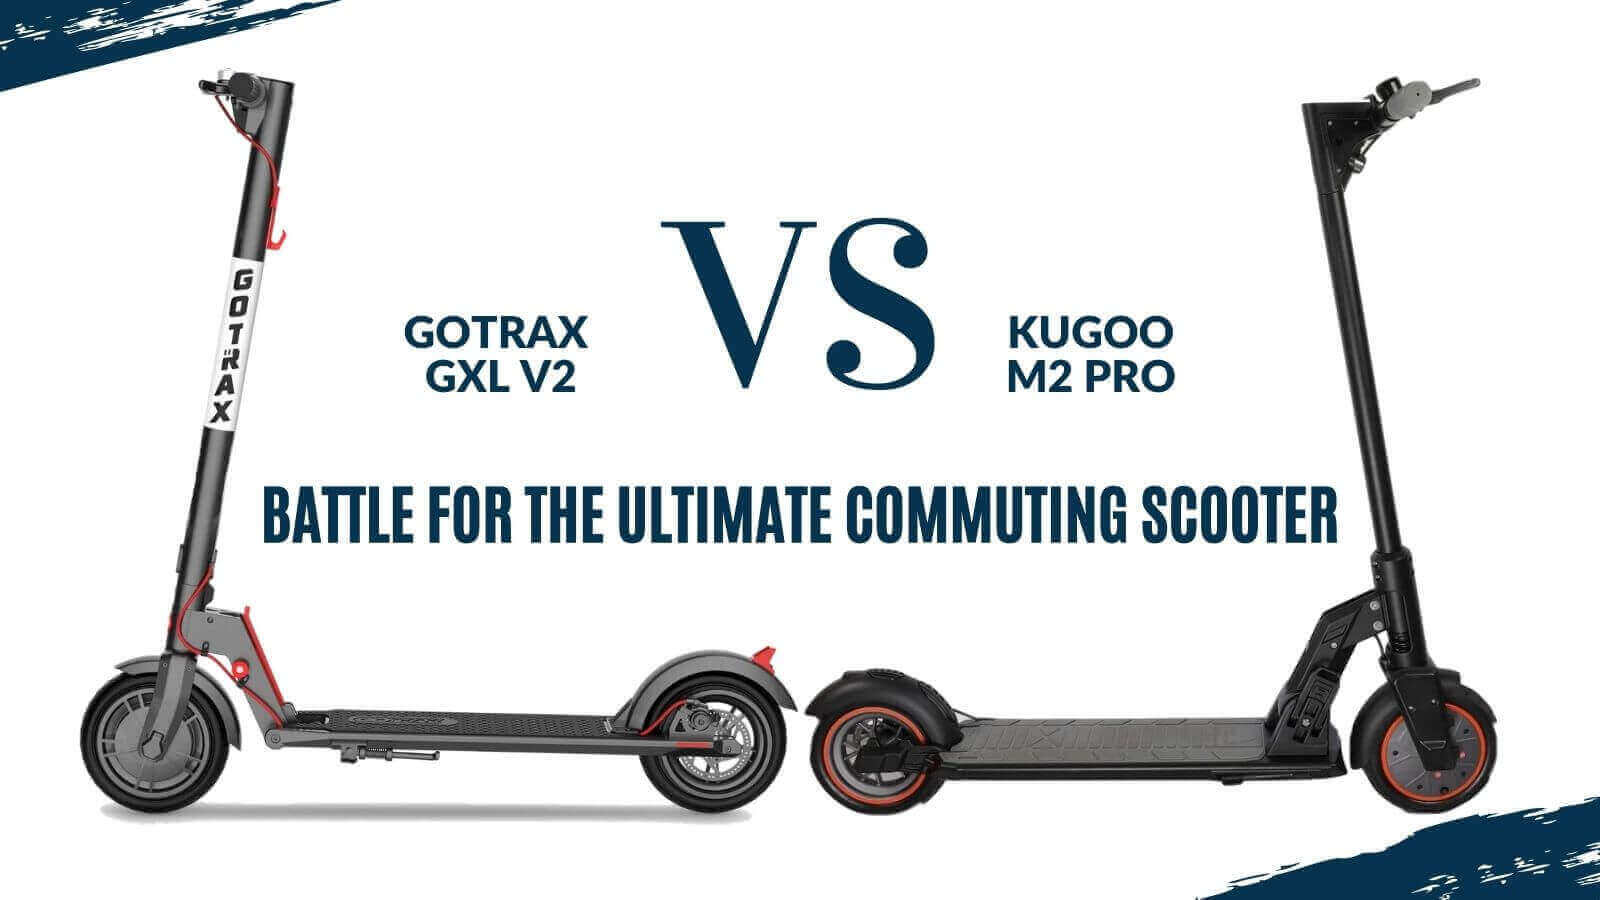 GoTrax GXL V2 vs. Kugoo M2 Pro